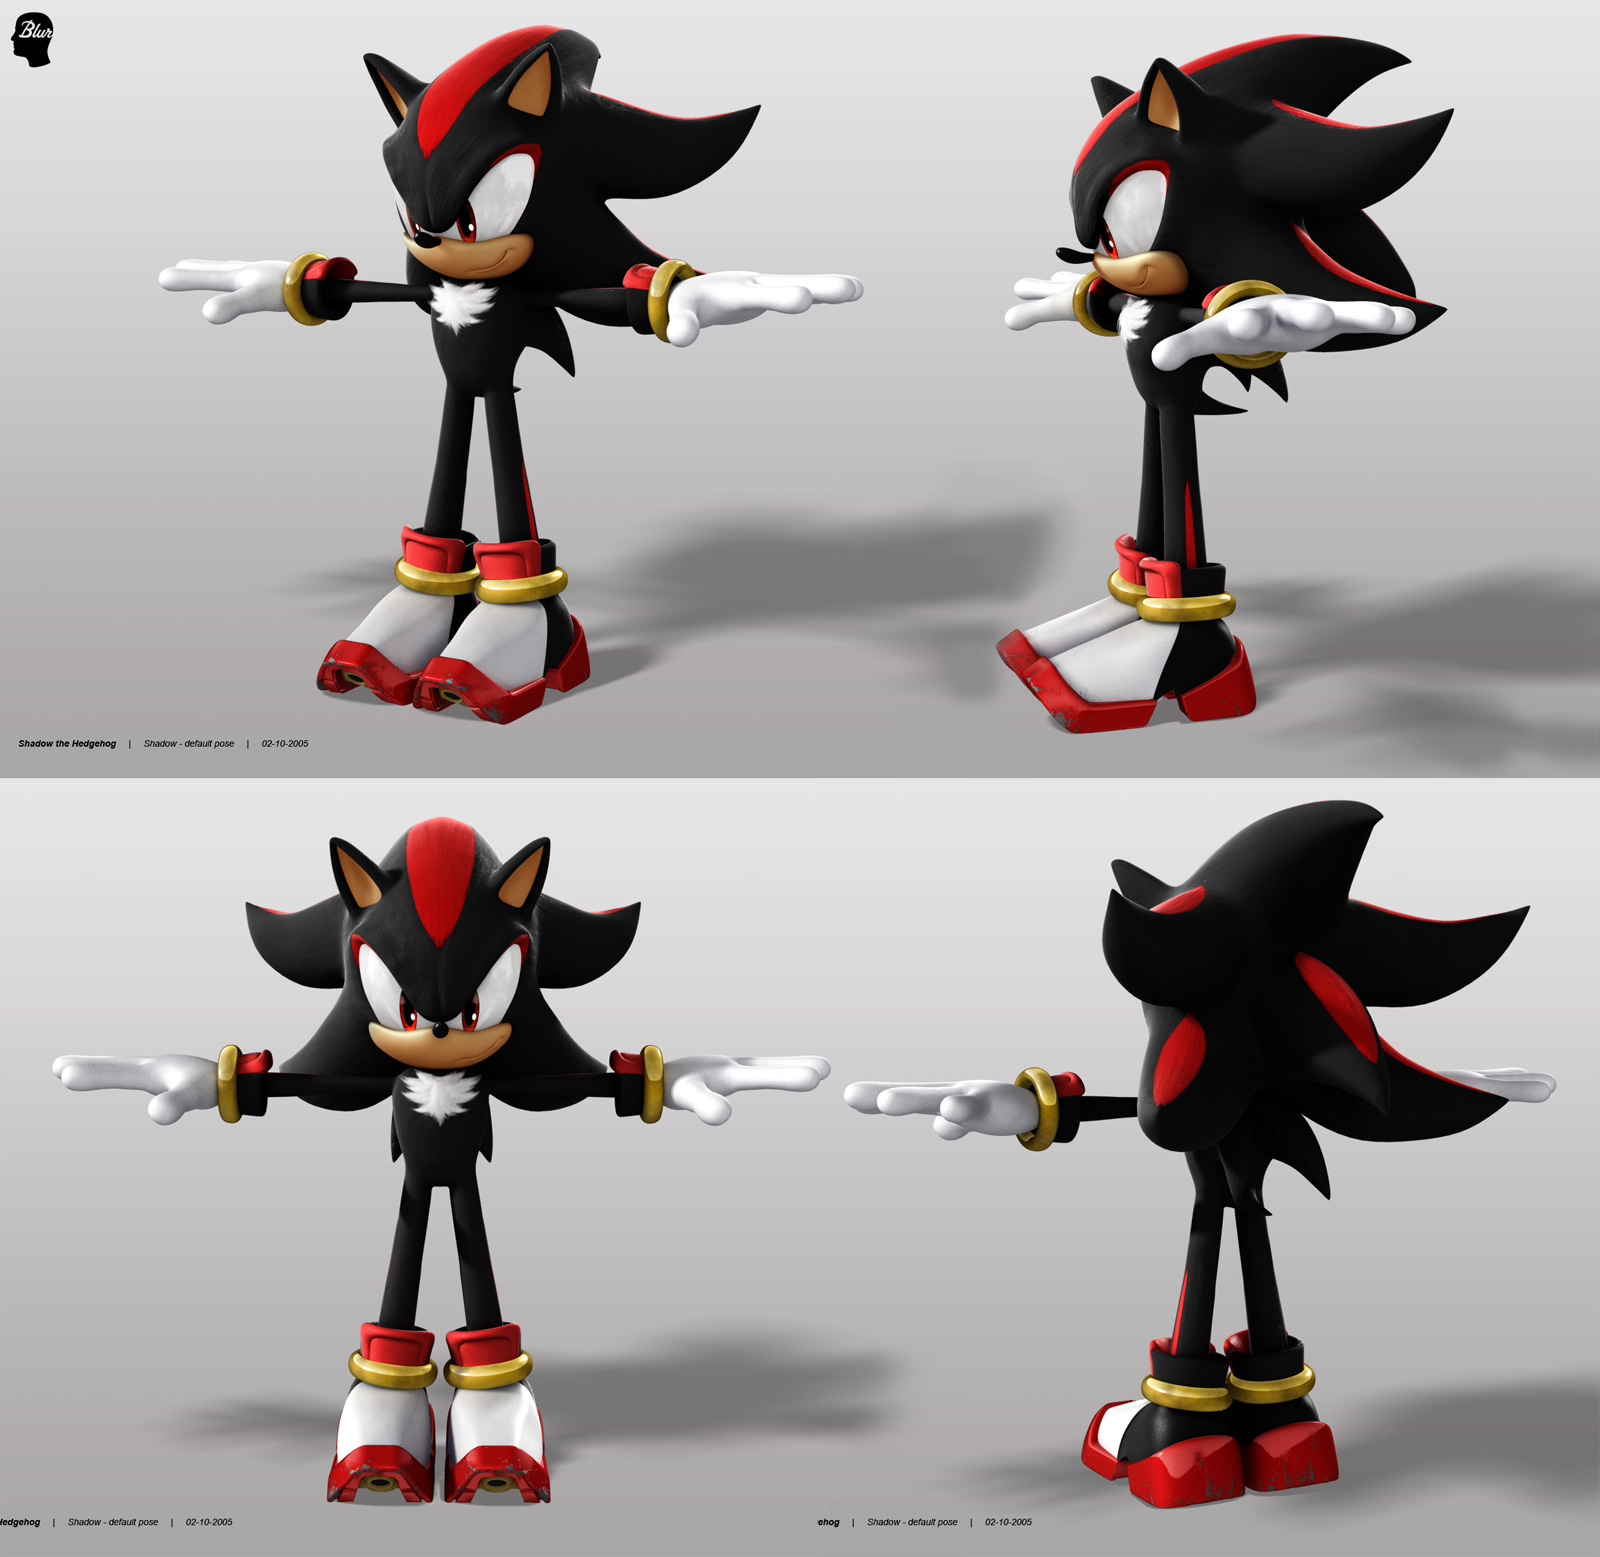 Silver The Hedgehog Concept Art